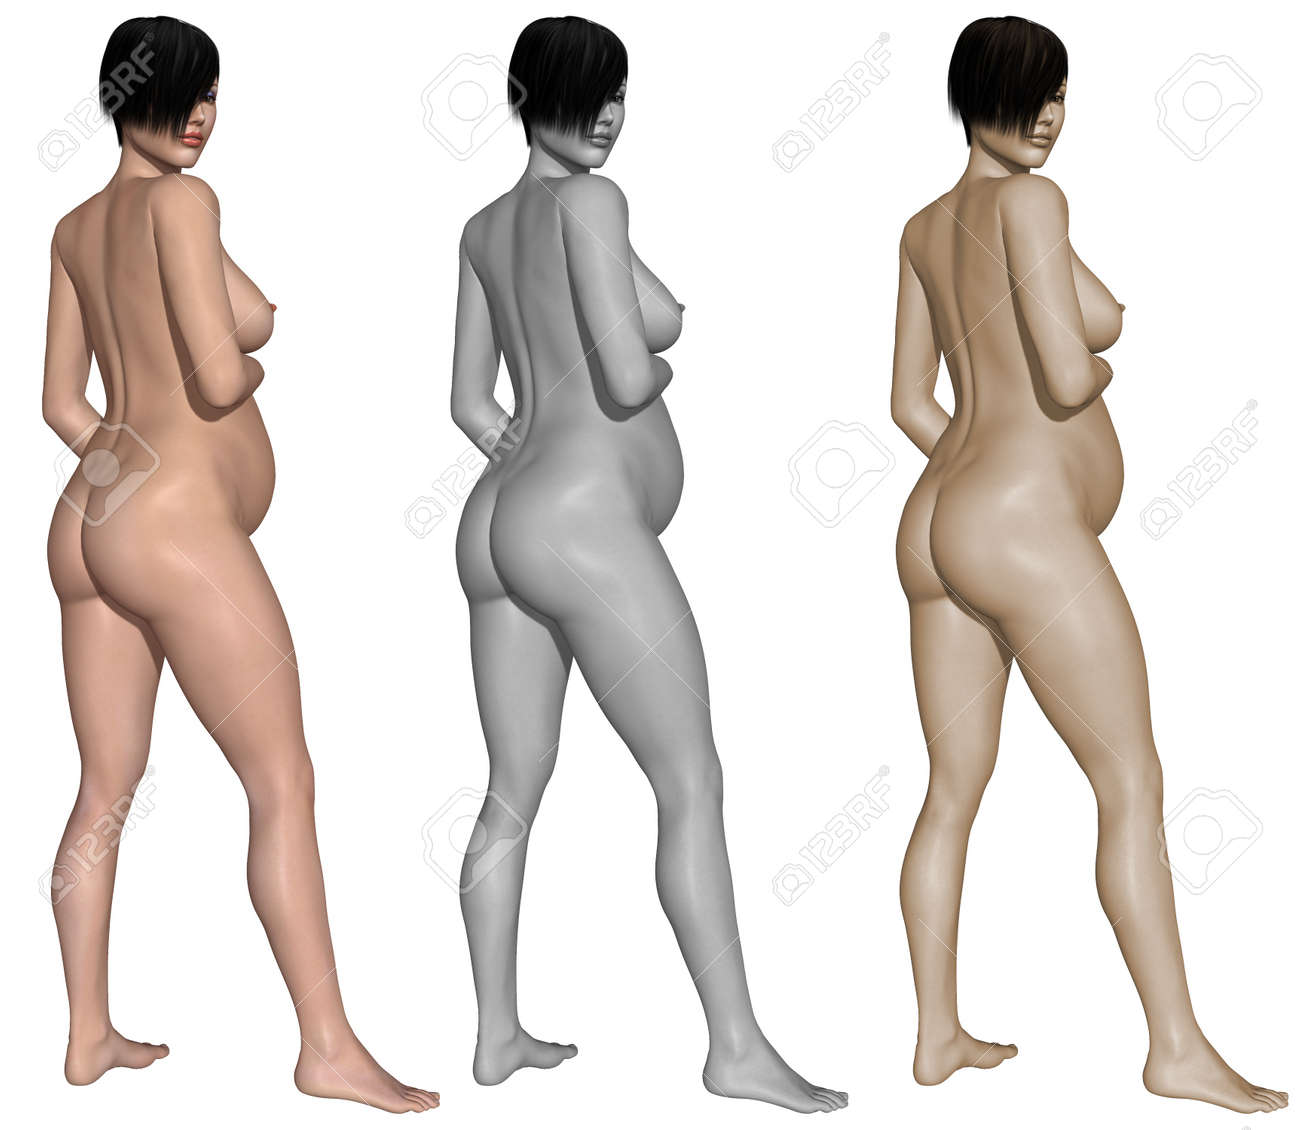 Nude pregnant woman Stock Photo - 10011394